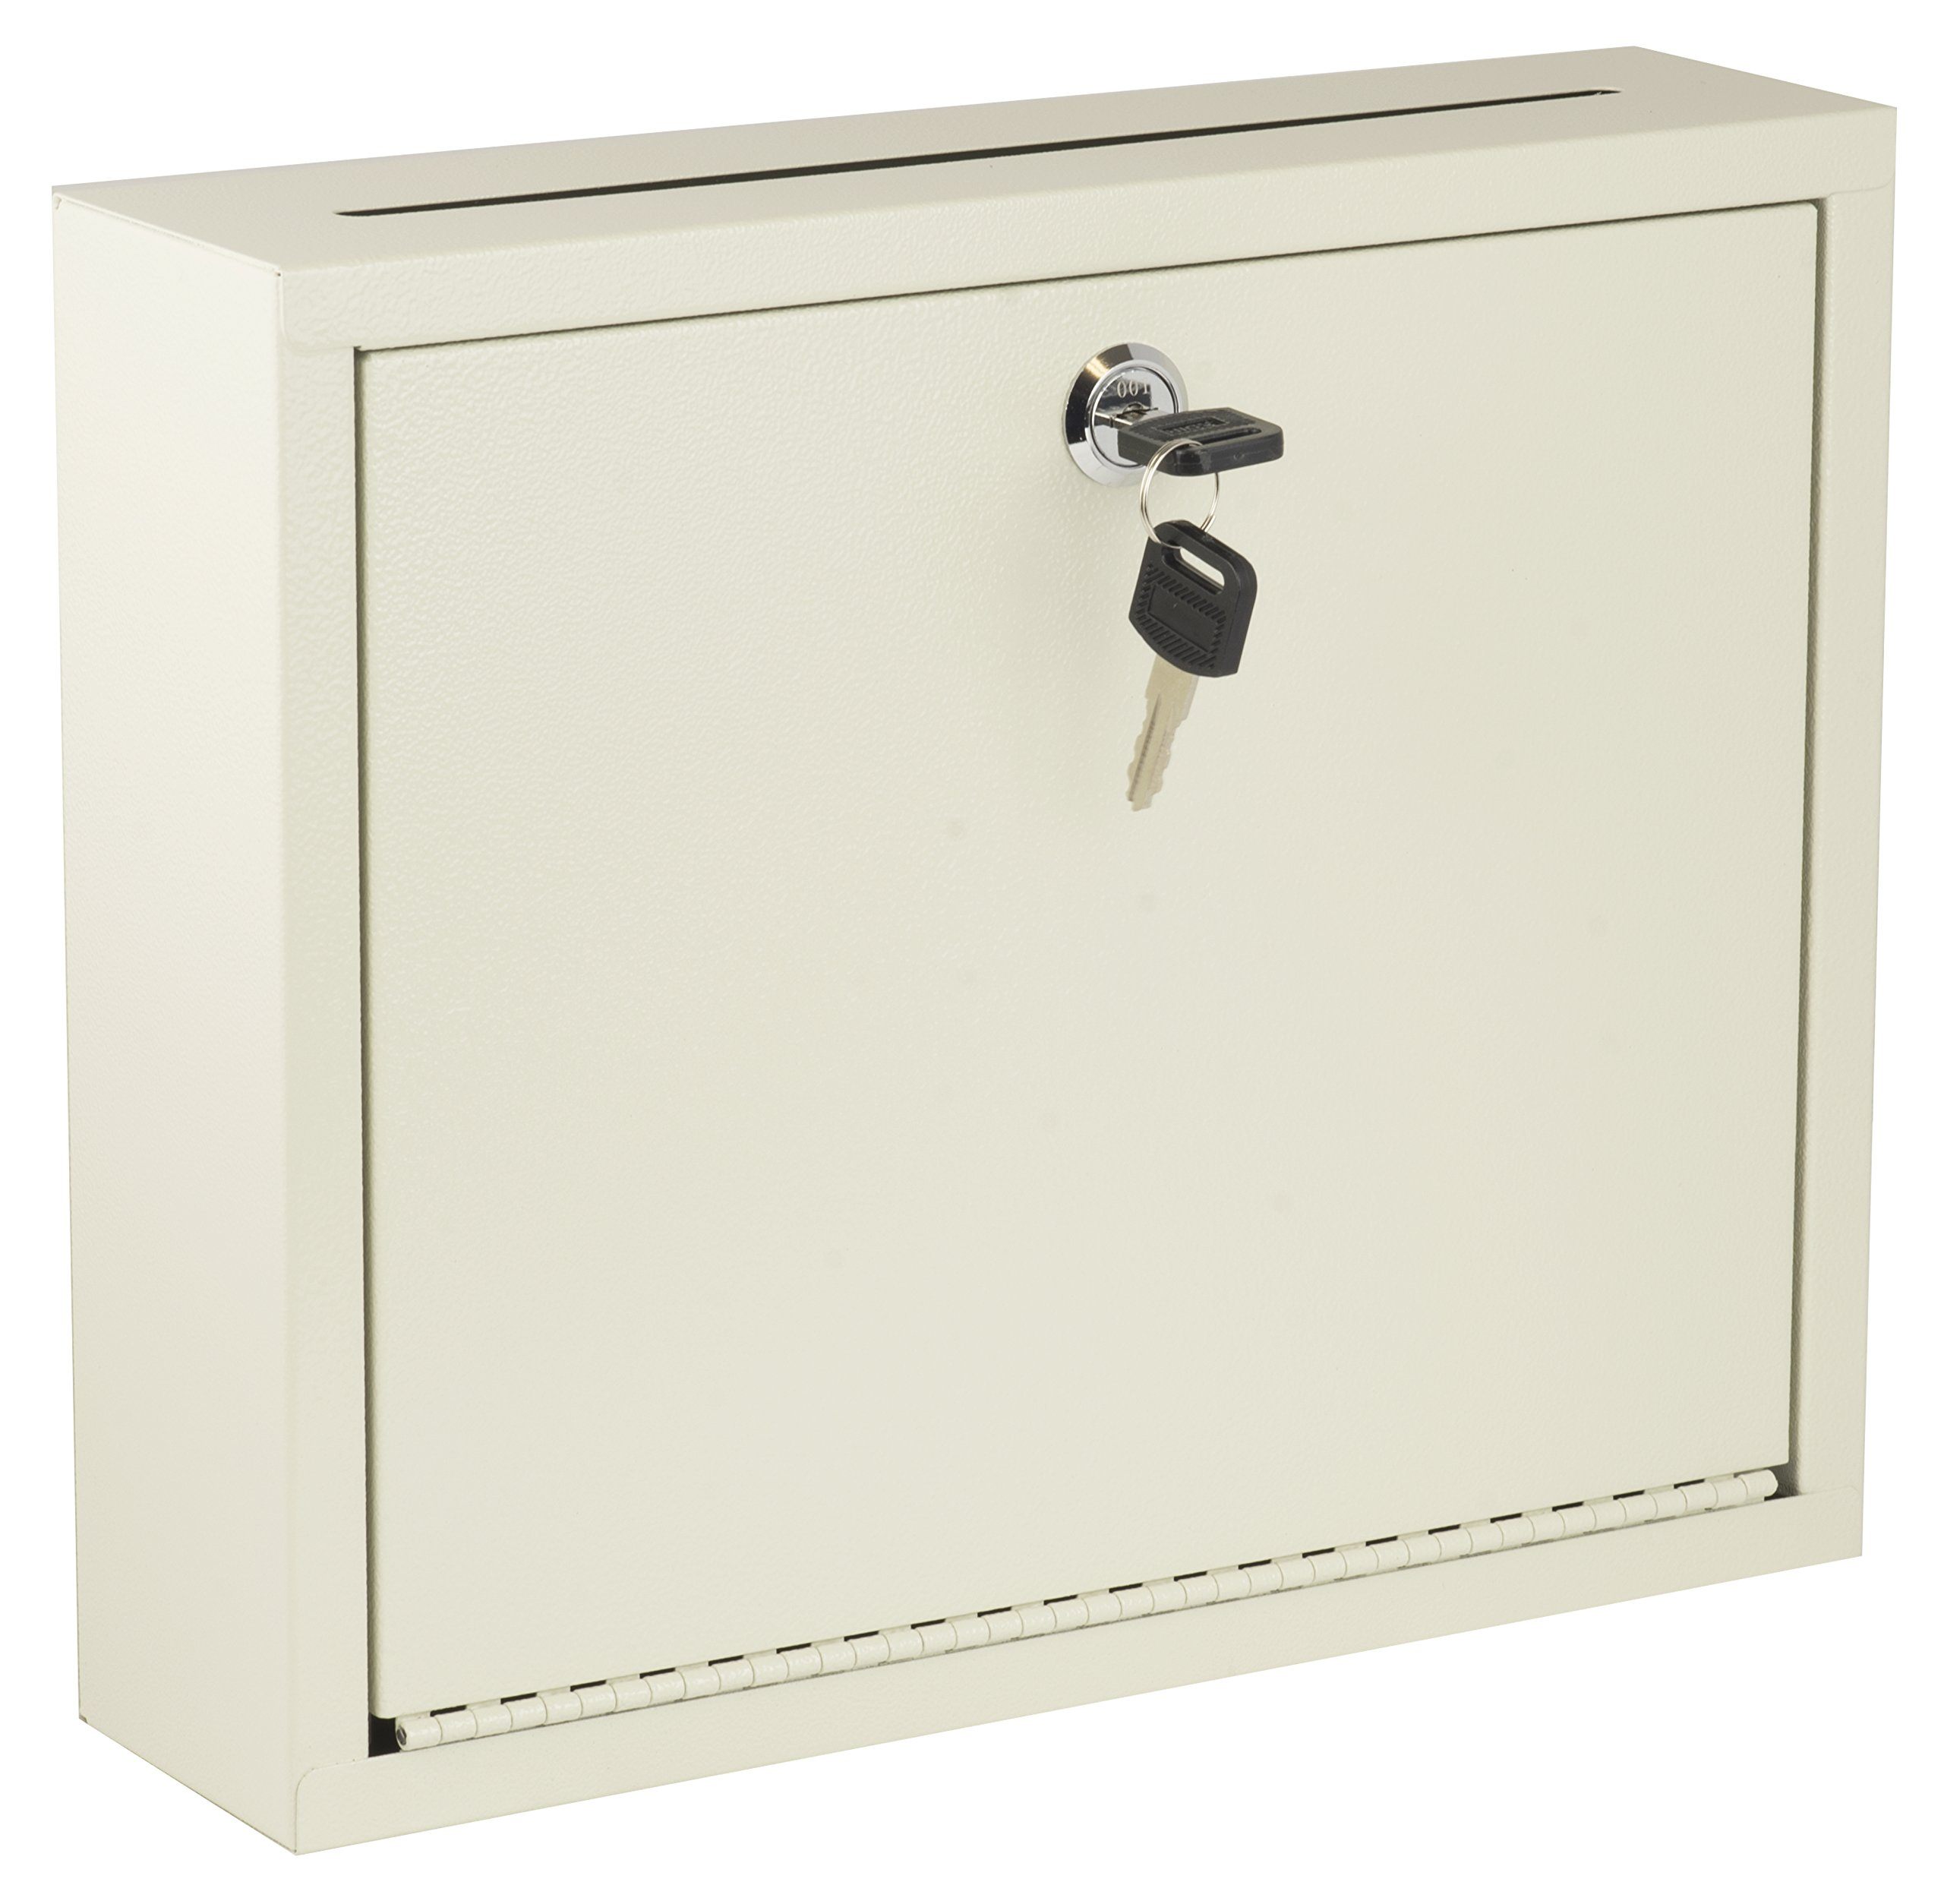 AdirOffice Multi Purpose, Mail Box, Drop Box, Suggestion Box, Wall Mountable, 3'' x 10'' x 12'' - Sand Beige by Adir Corp. (Image #1)